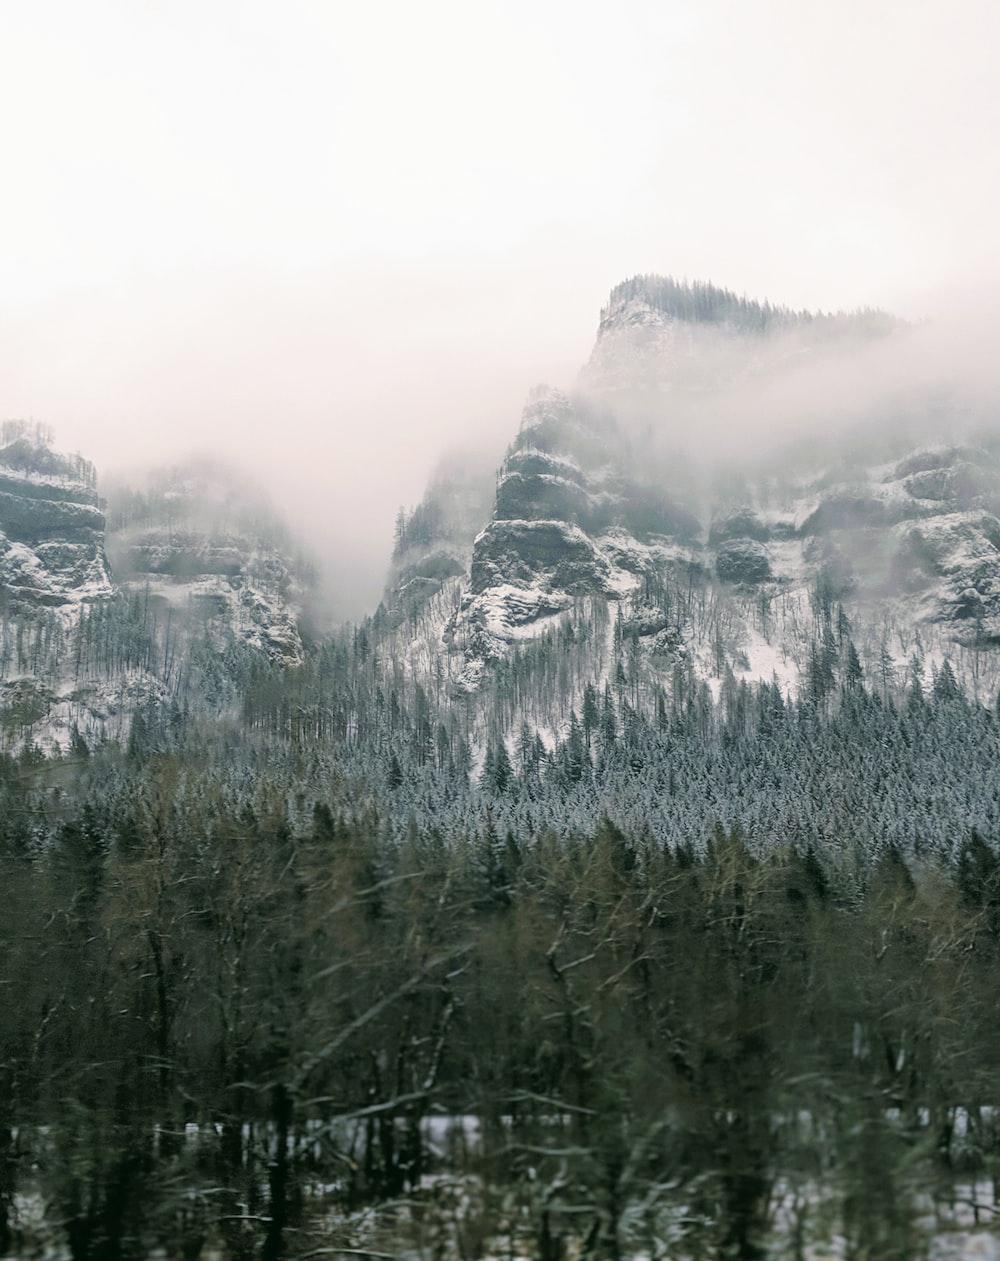 green trees near mountains